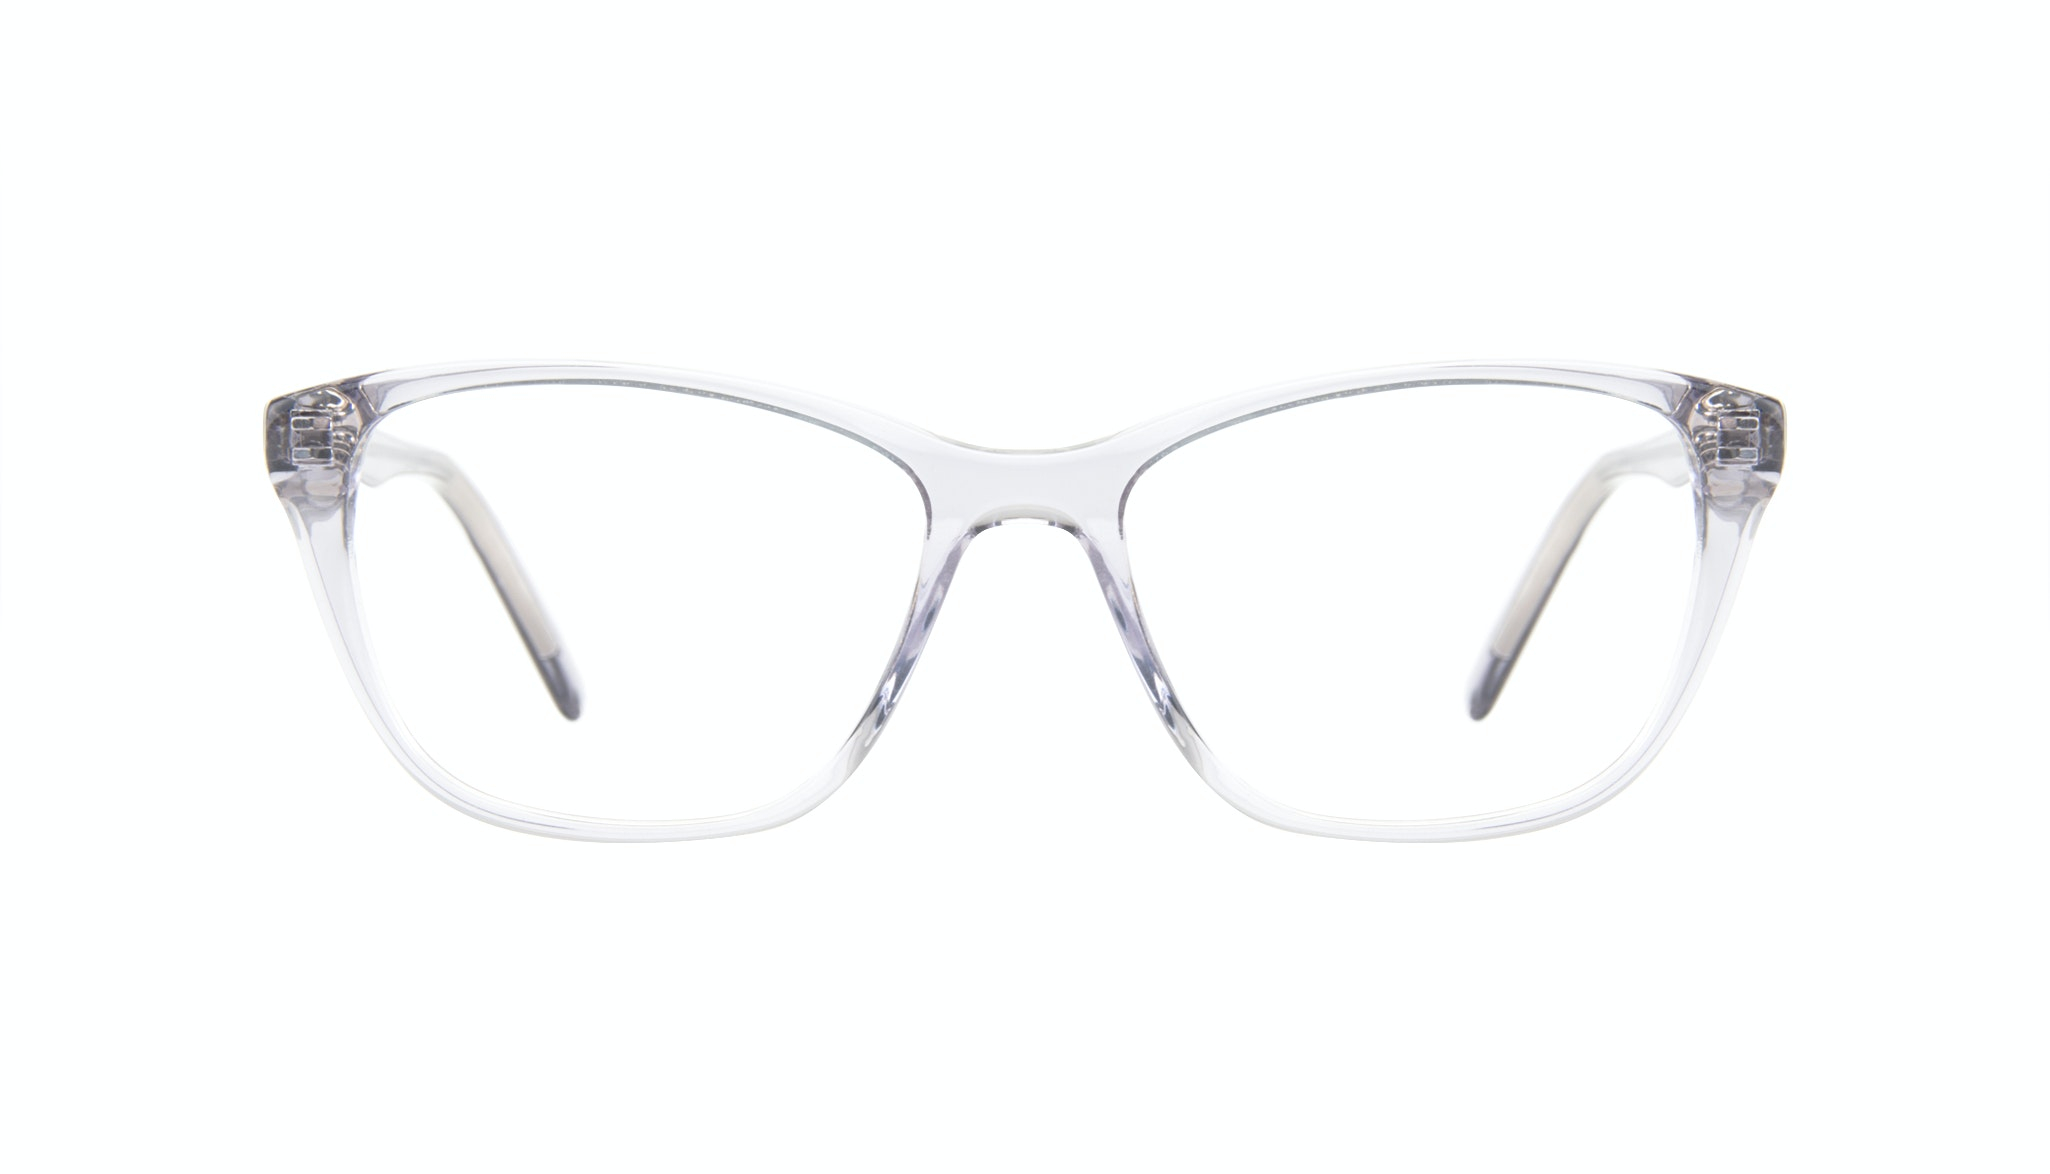 Affordable Fashion Glasses Cat Eye Eyeglasses Women Myrtle Petite Cloud